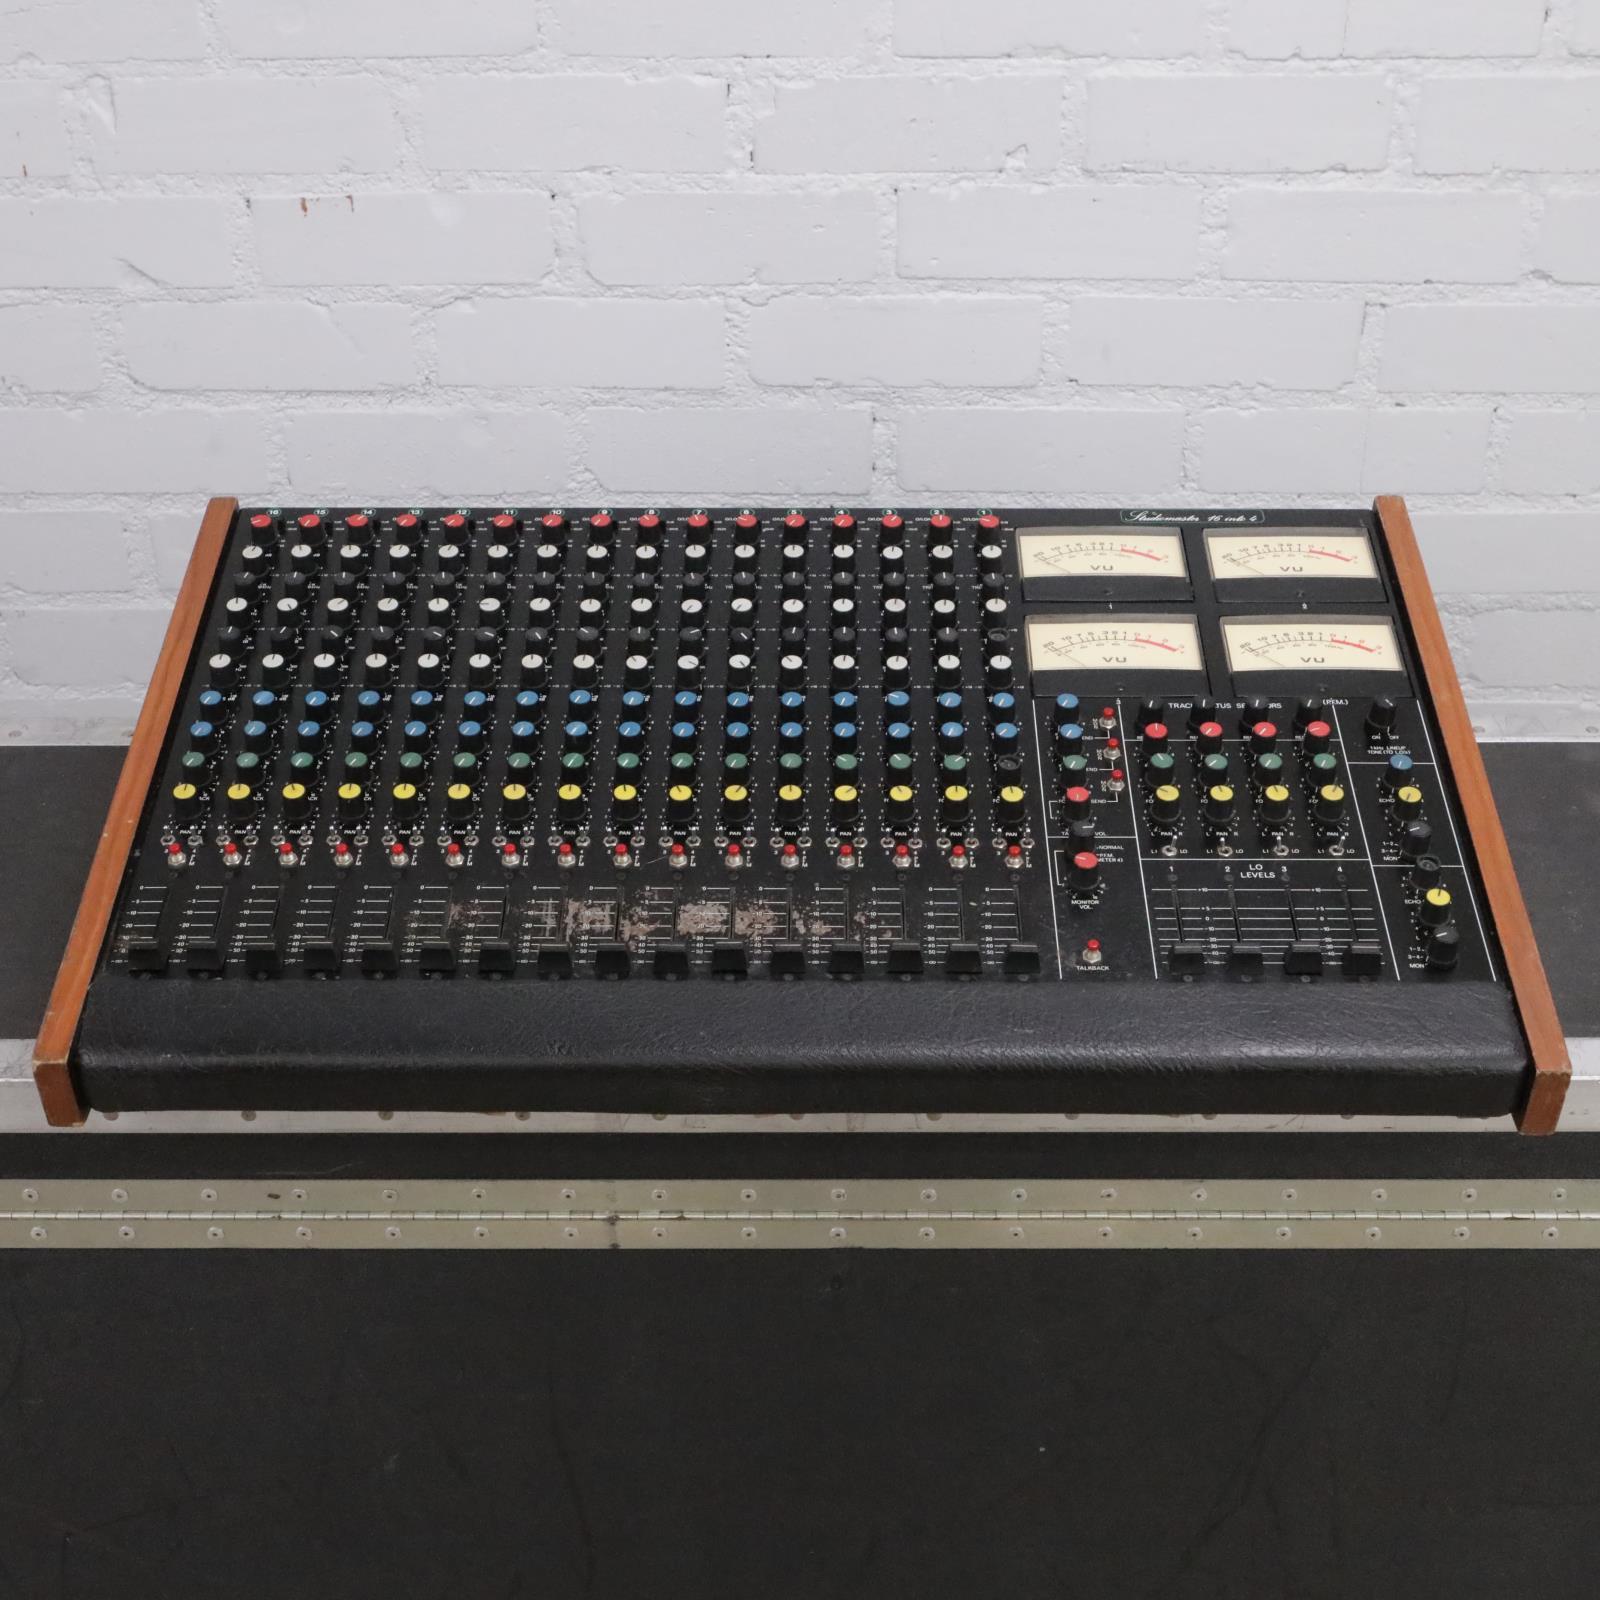 Studio Master 16 into 4 16-Ch Studio Analog Mixer w/ Original Case #44027